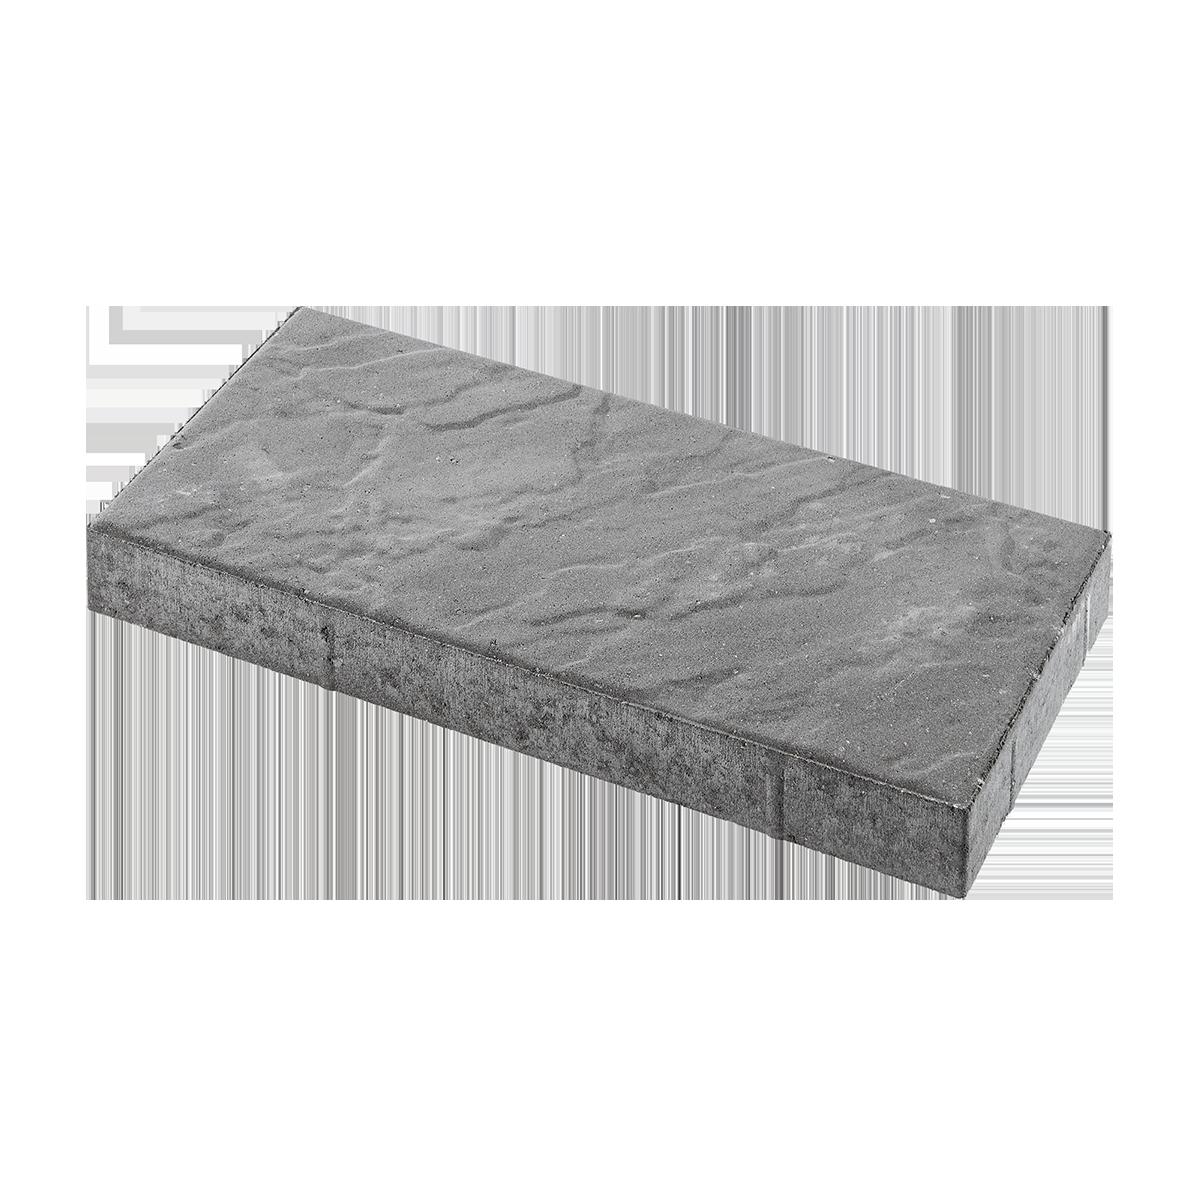 Skiferpræg 30x60x6 cm Grå